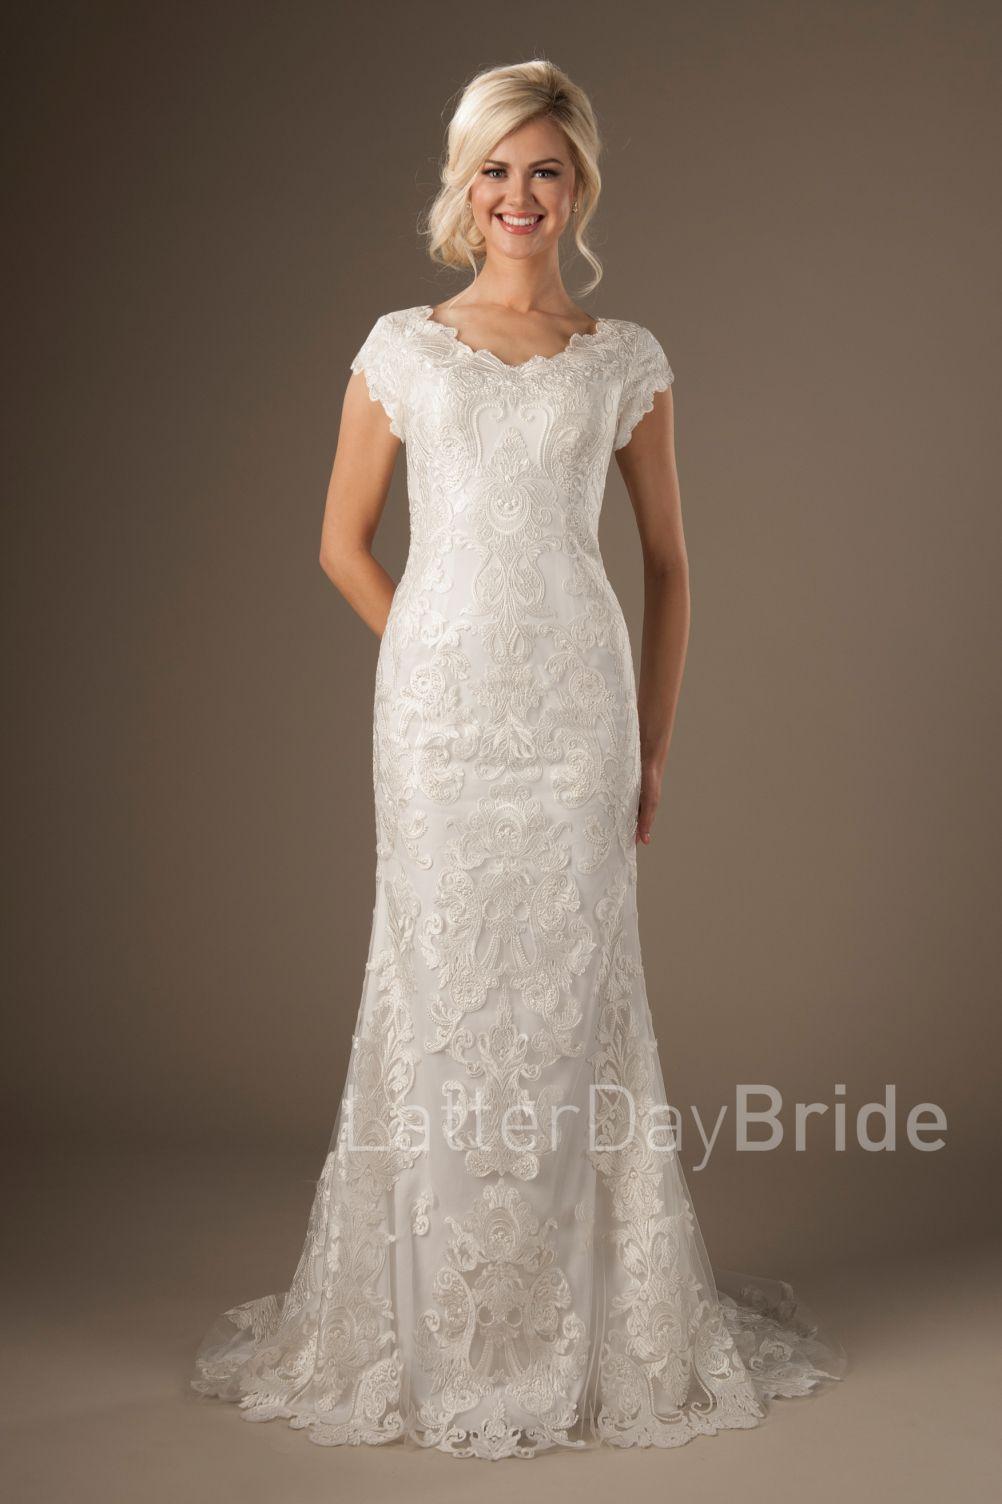 Modest lace wedding dresses womenus dresses for wedding guest